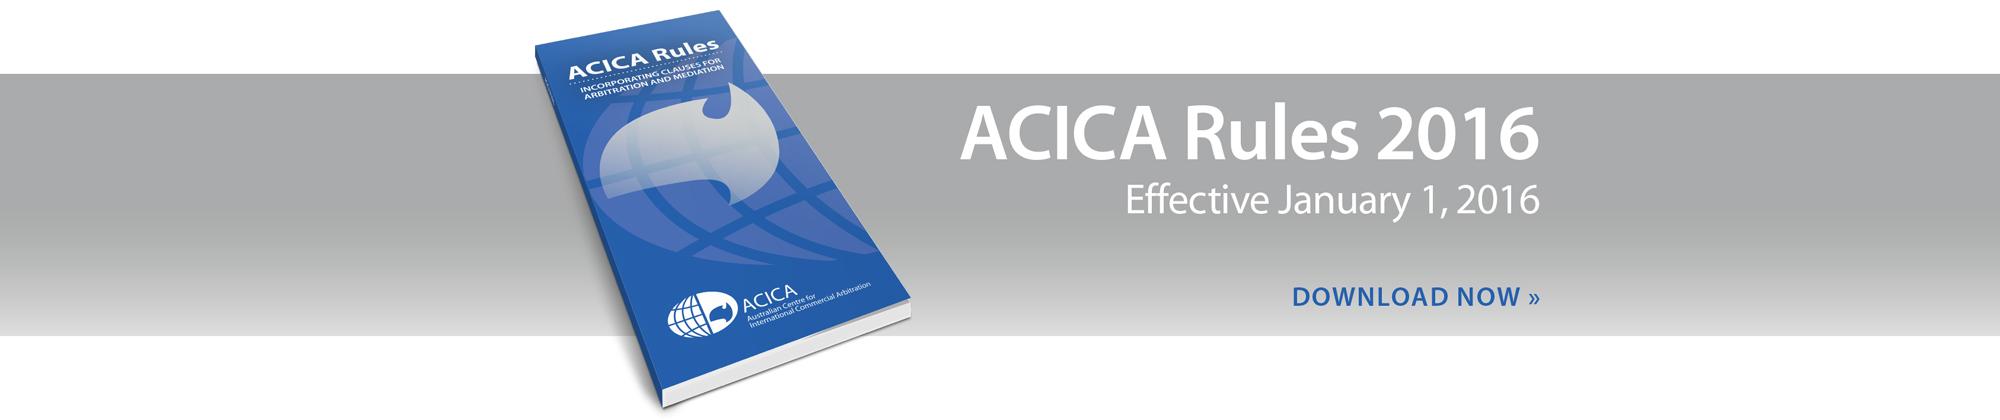 ACIC_Rules_slide‐04